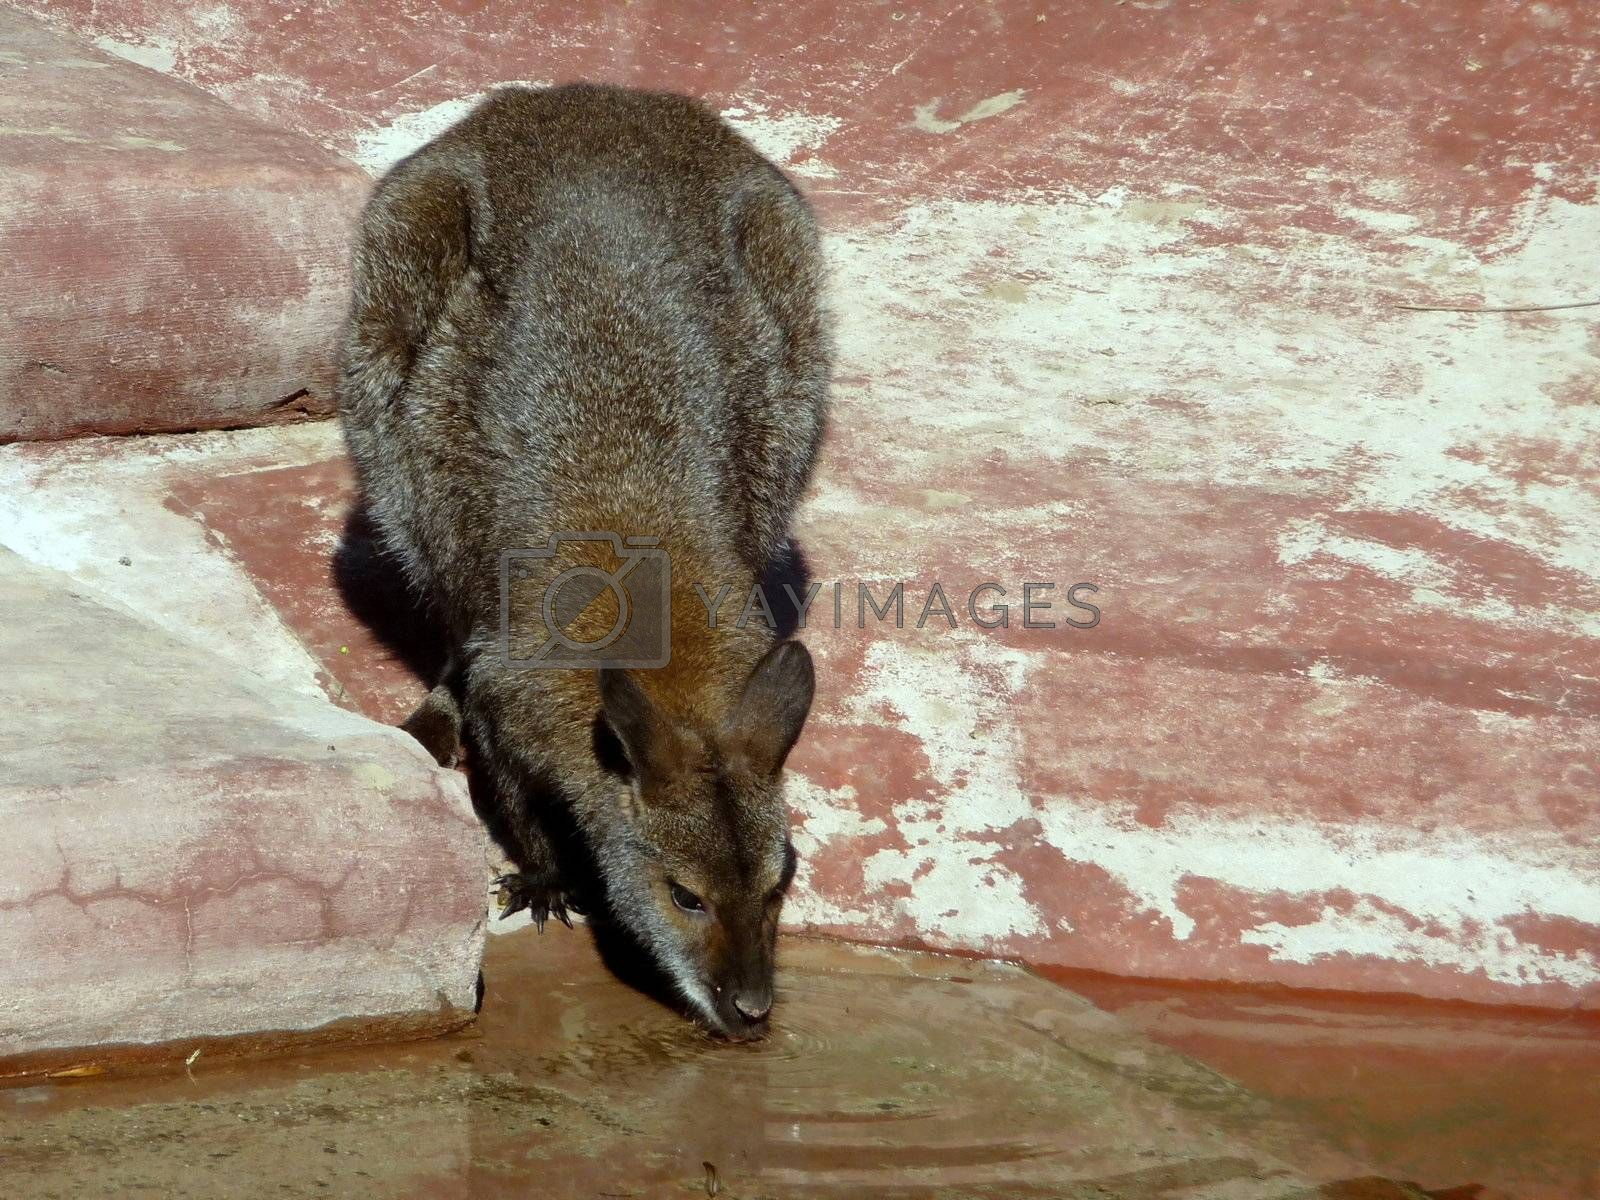 Royalty free image of Kangaroo drinks water by tomatto